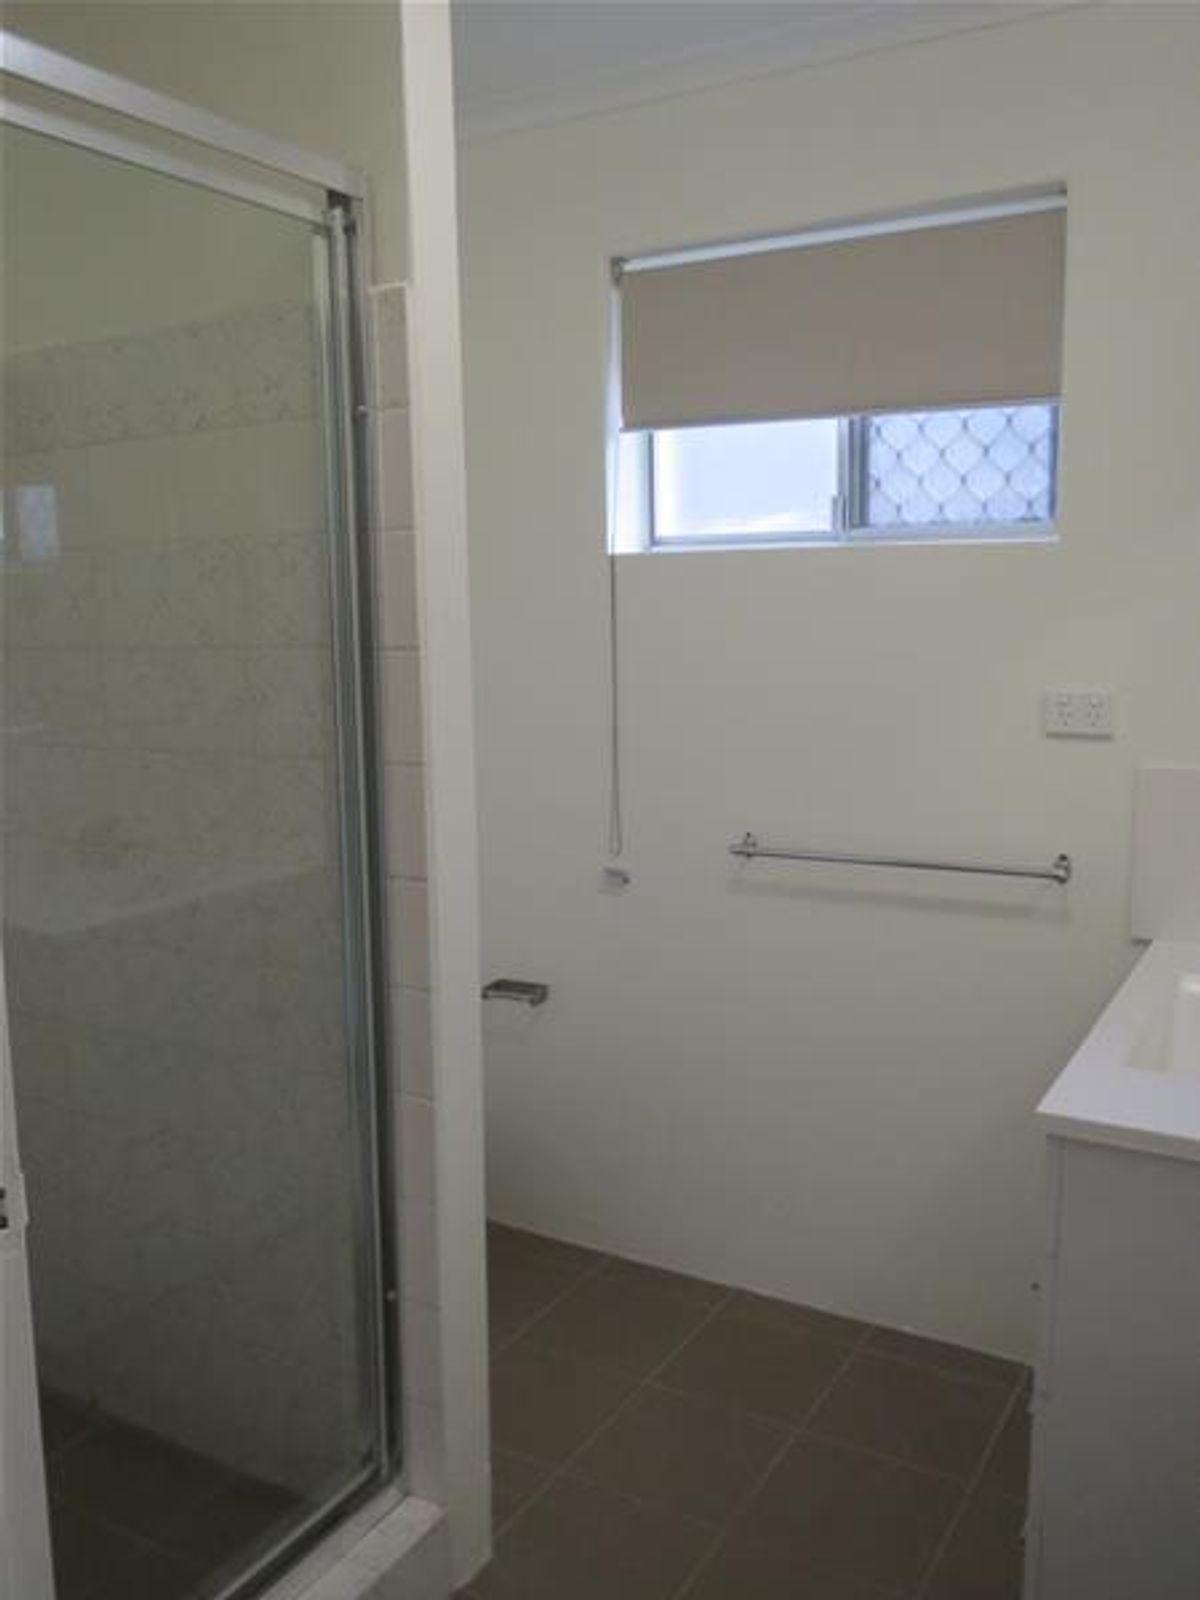 5/54 Crest Street, Mount Gravatt East, QLD 4122